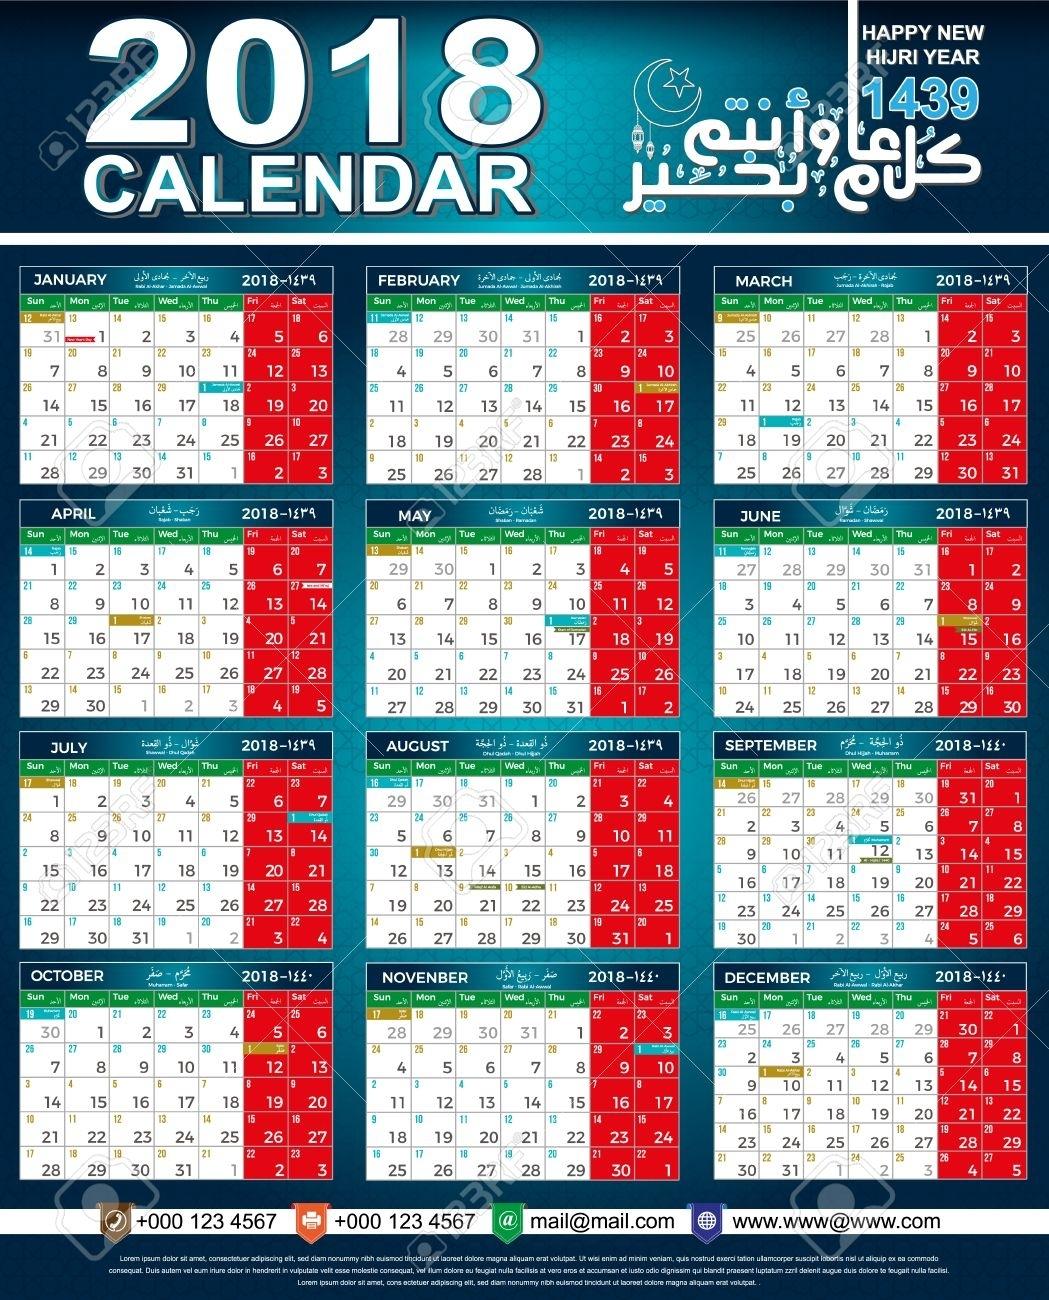 Calendar 2018 - Hijri 1439 Islamic - Arabic & English Dates -..